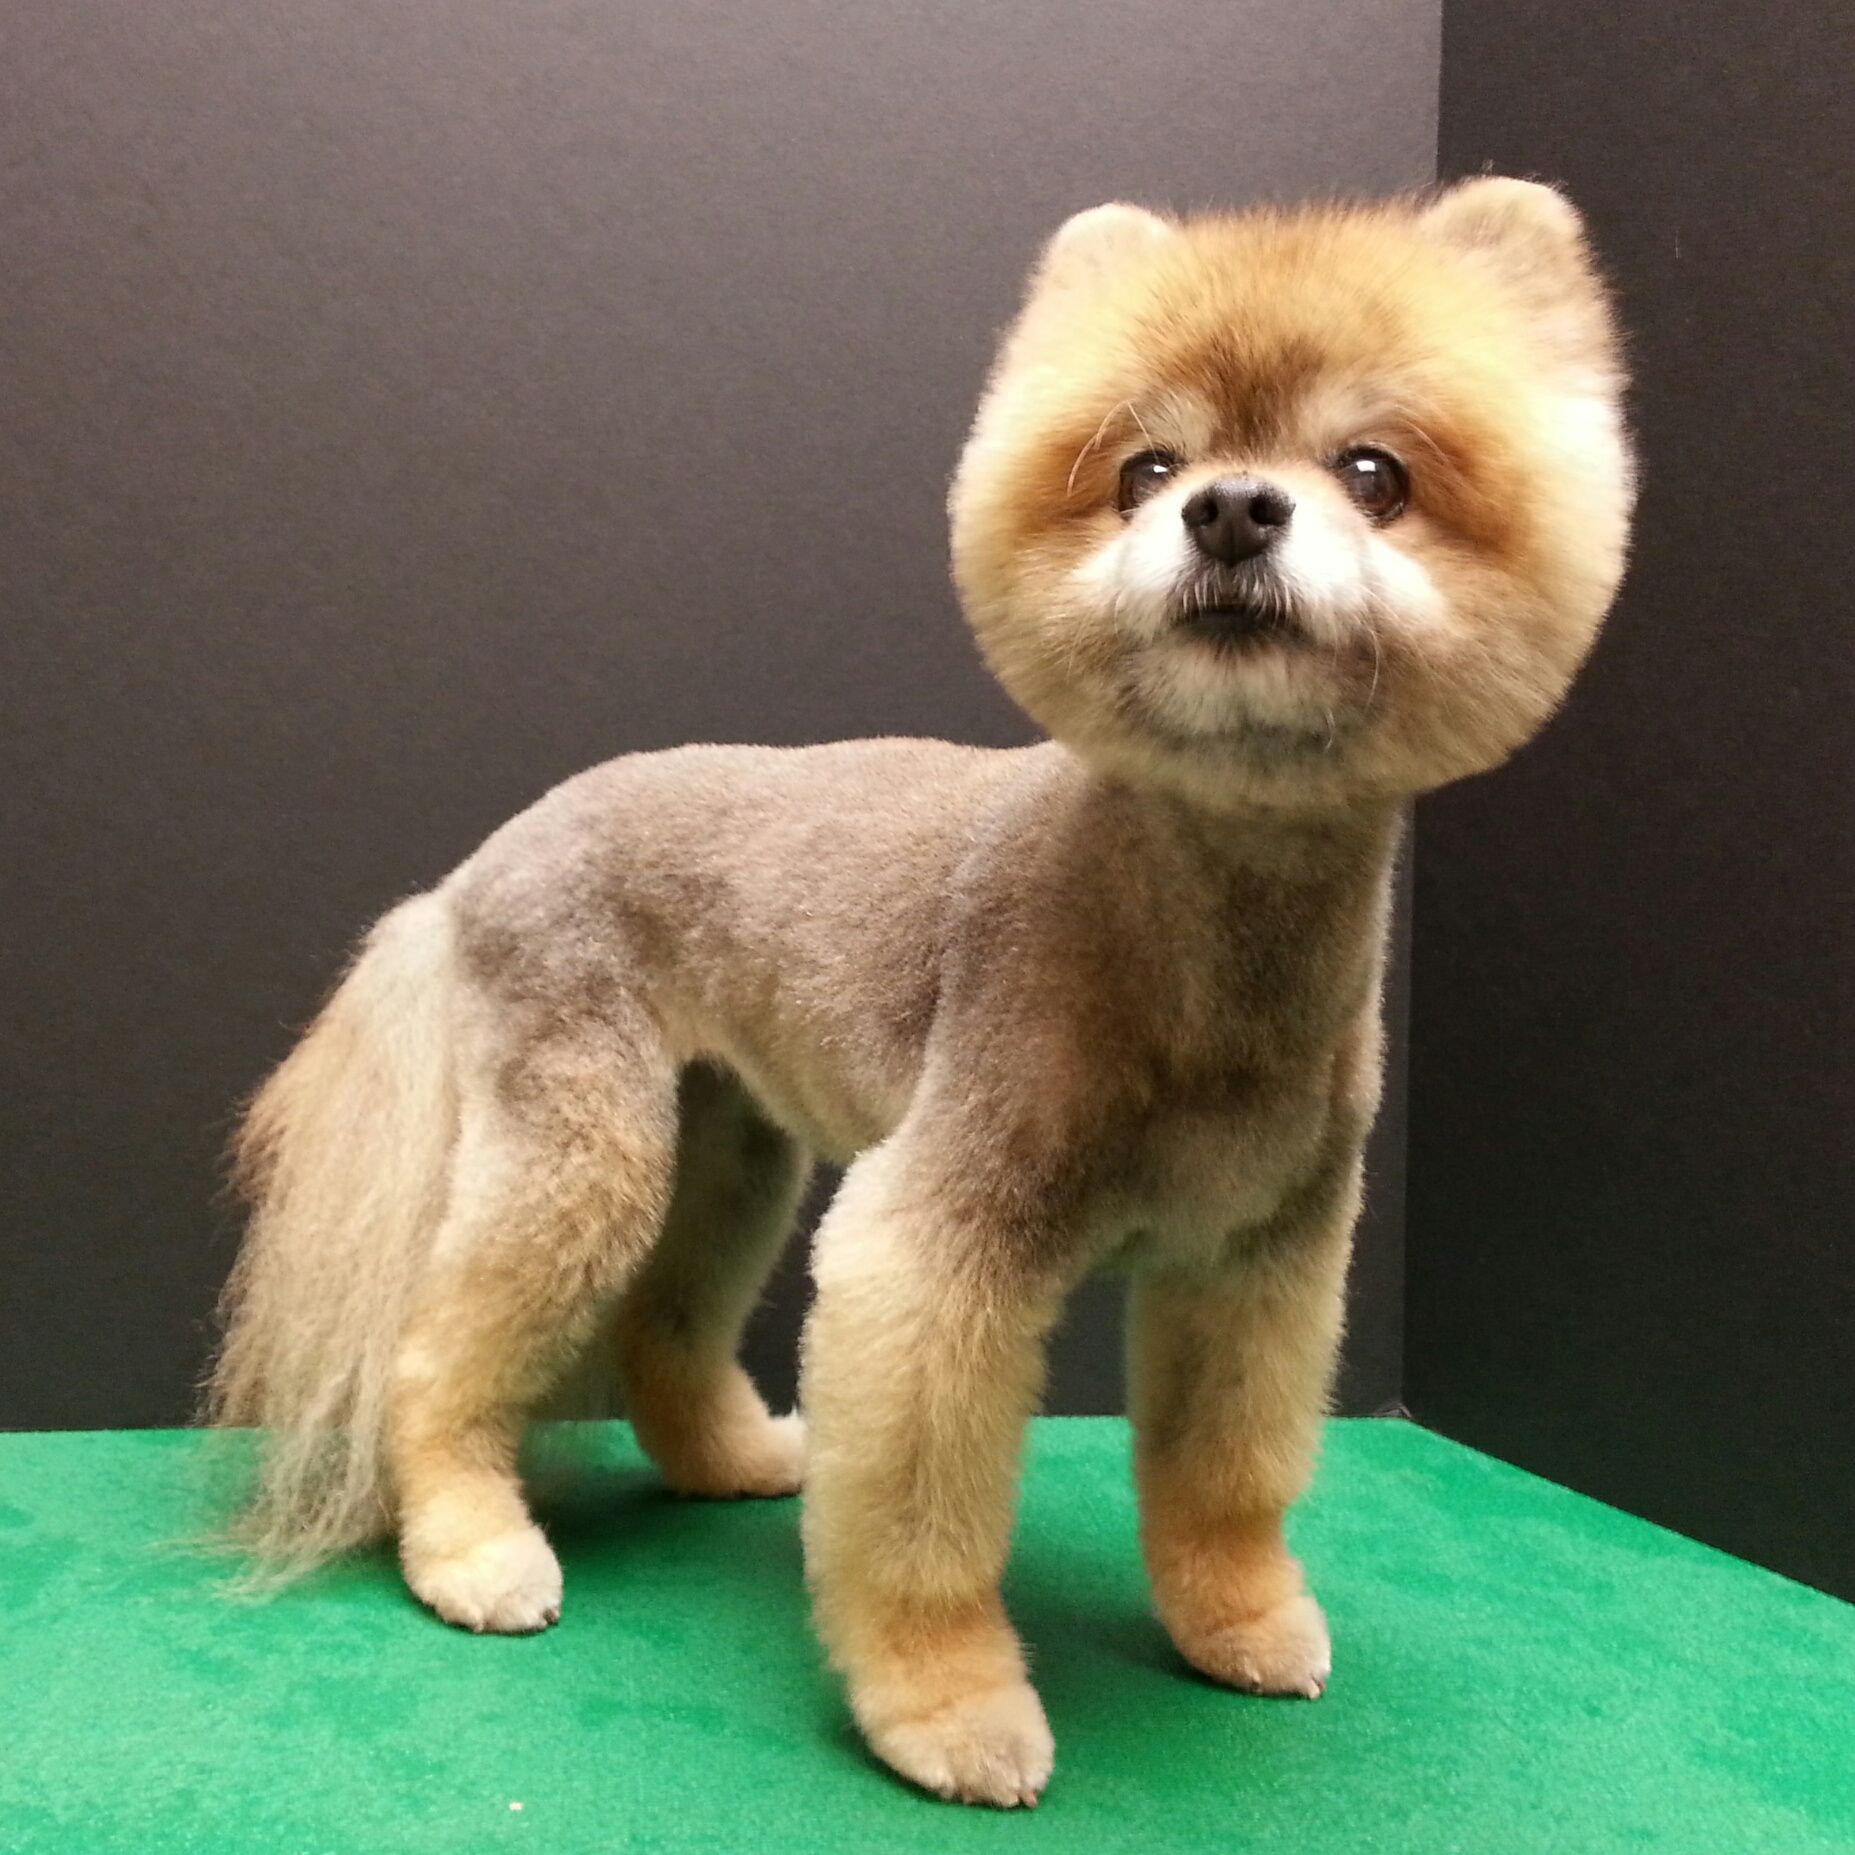 Pomeranian Haircut Pom Grooming Boo Haircut Toy Pomeranian Puppies Pomeranian Dog Pomeranian Puppy